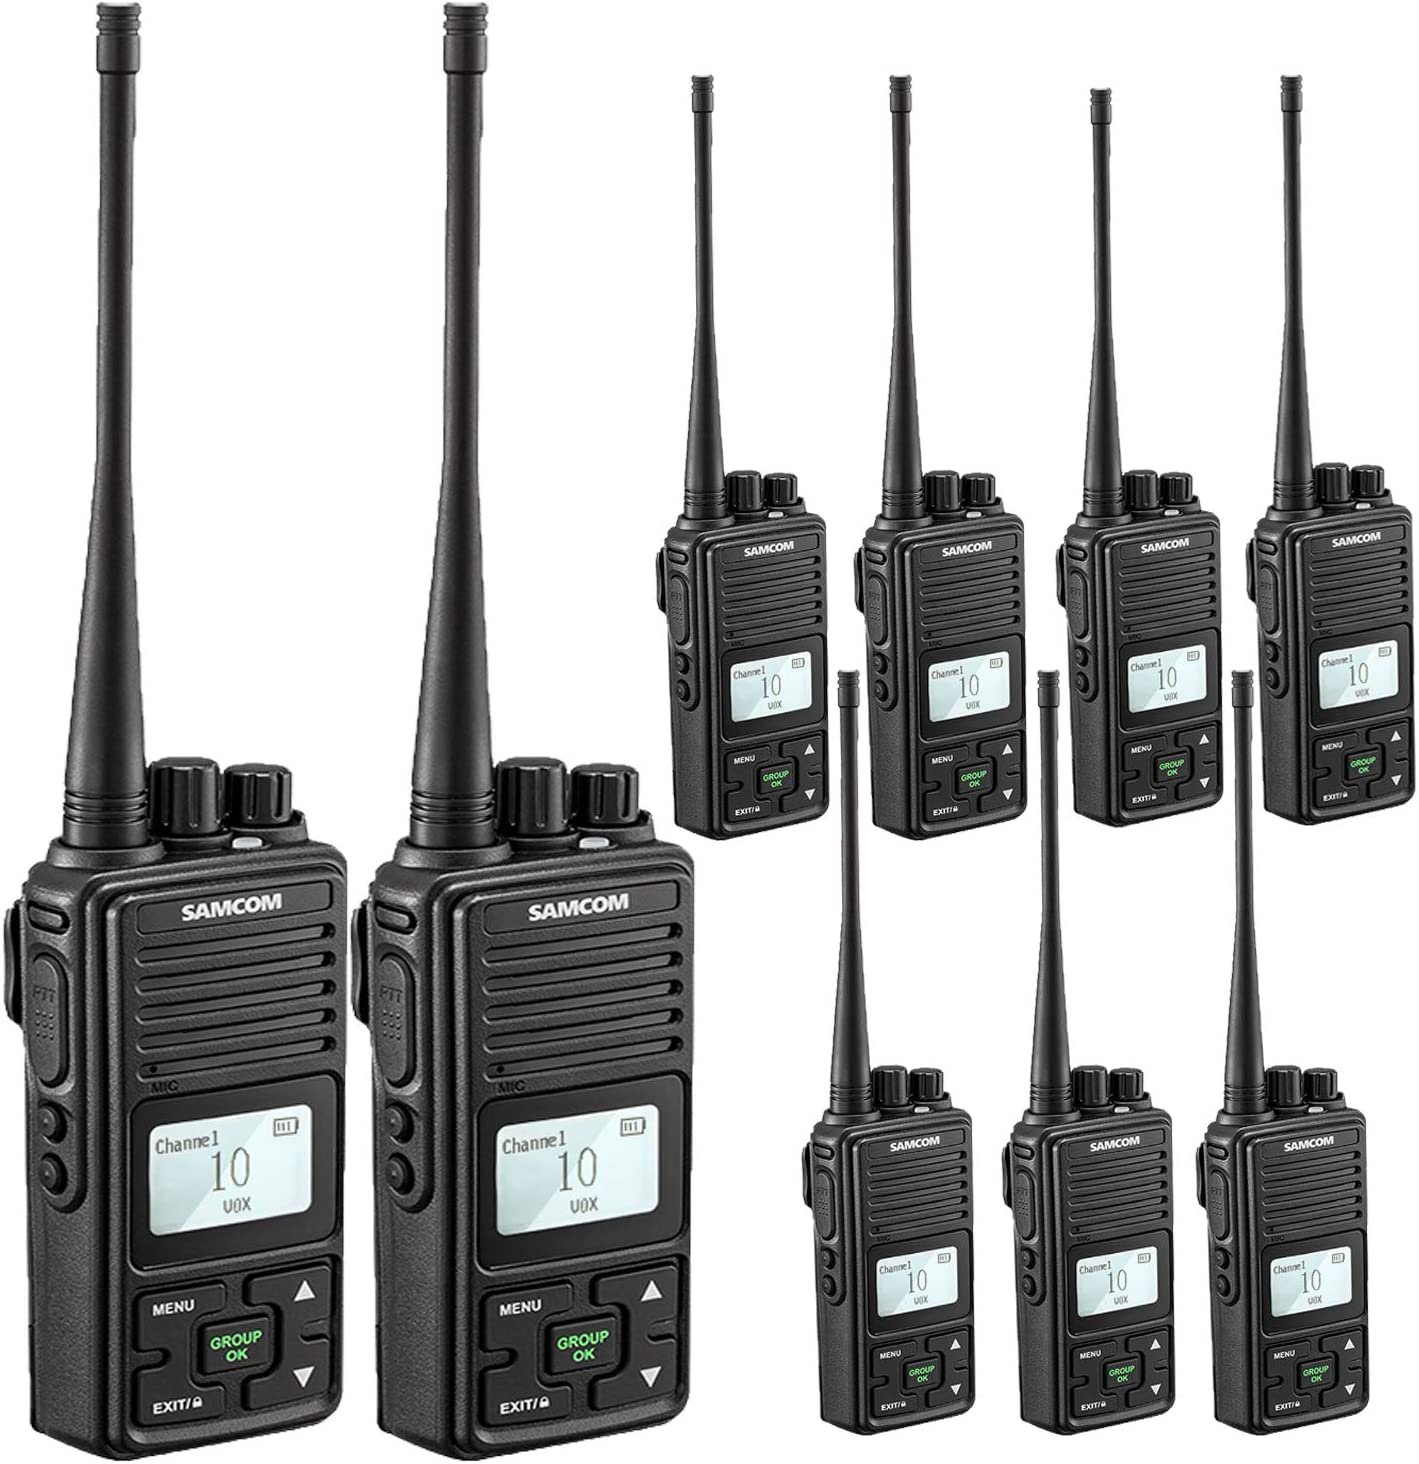 SAMCOM Two Way Radio 2 Watts Programmable UHF Handheld Walkie Talkie Long Range 20CH Double PTT LCD Display Earpieces, 9 Packs